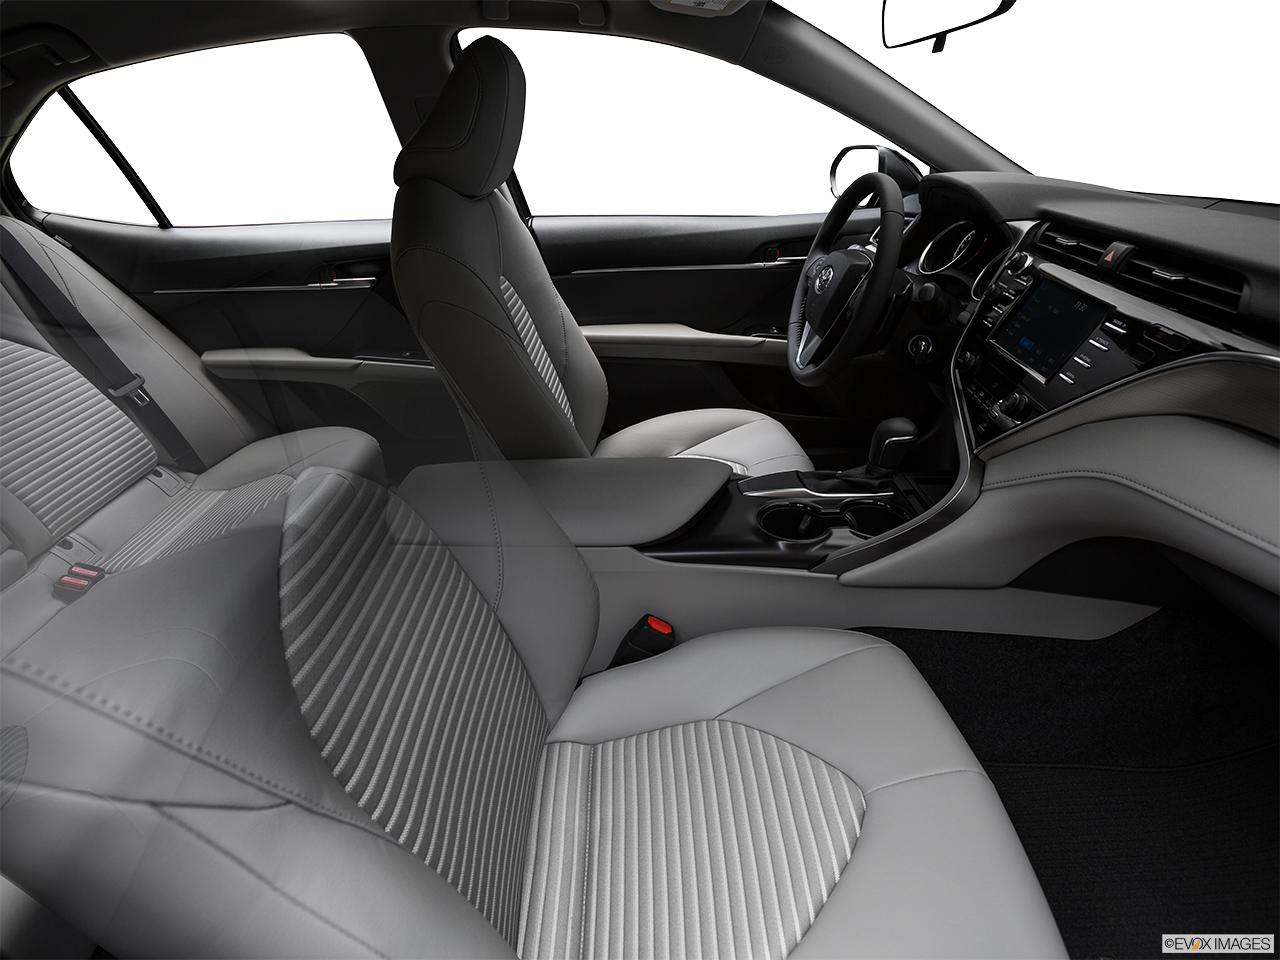 2018 toyota camry white interior. toyota canada: camry interior 2018 white